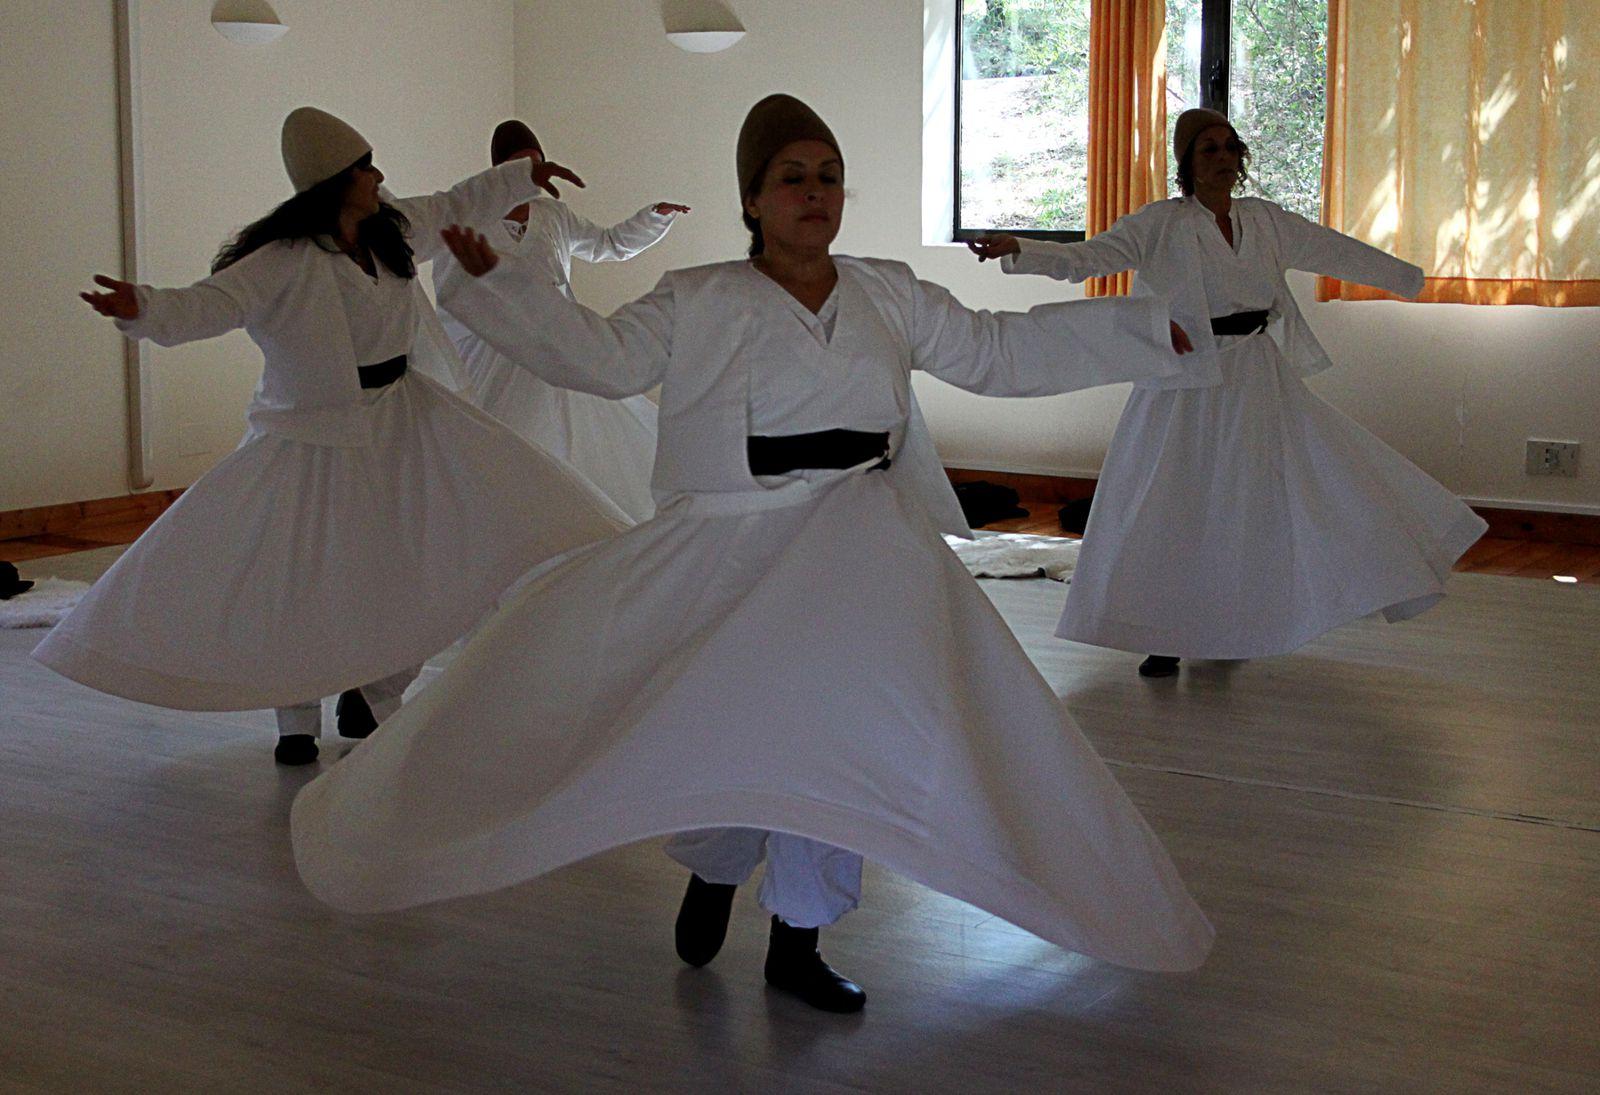 festi-spirit 2012 328b